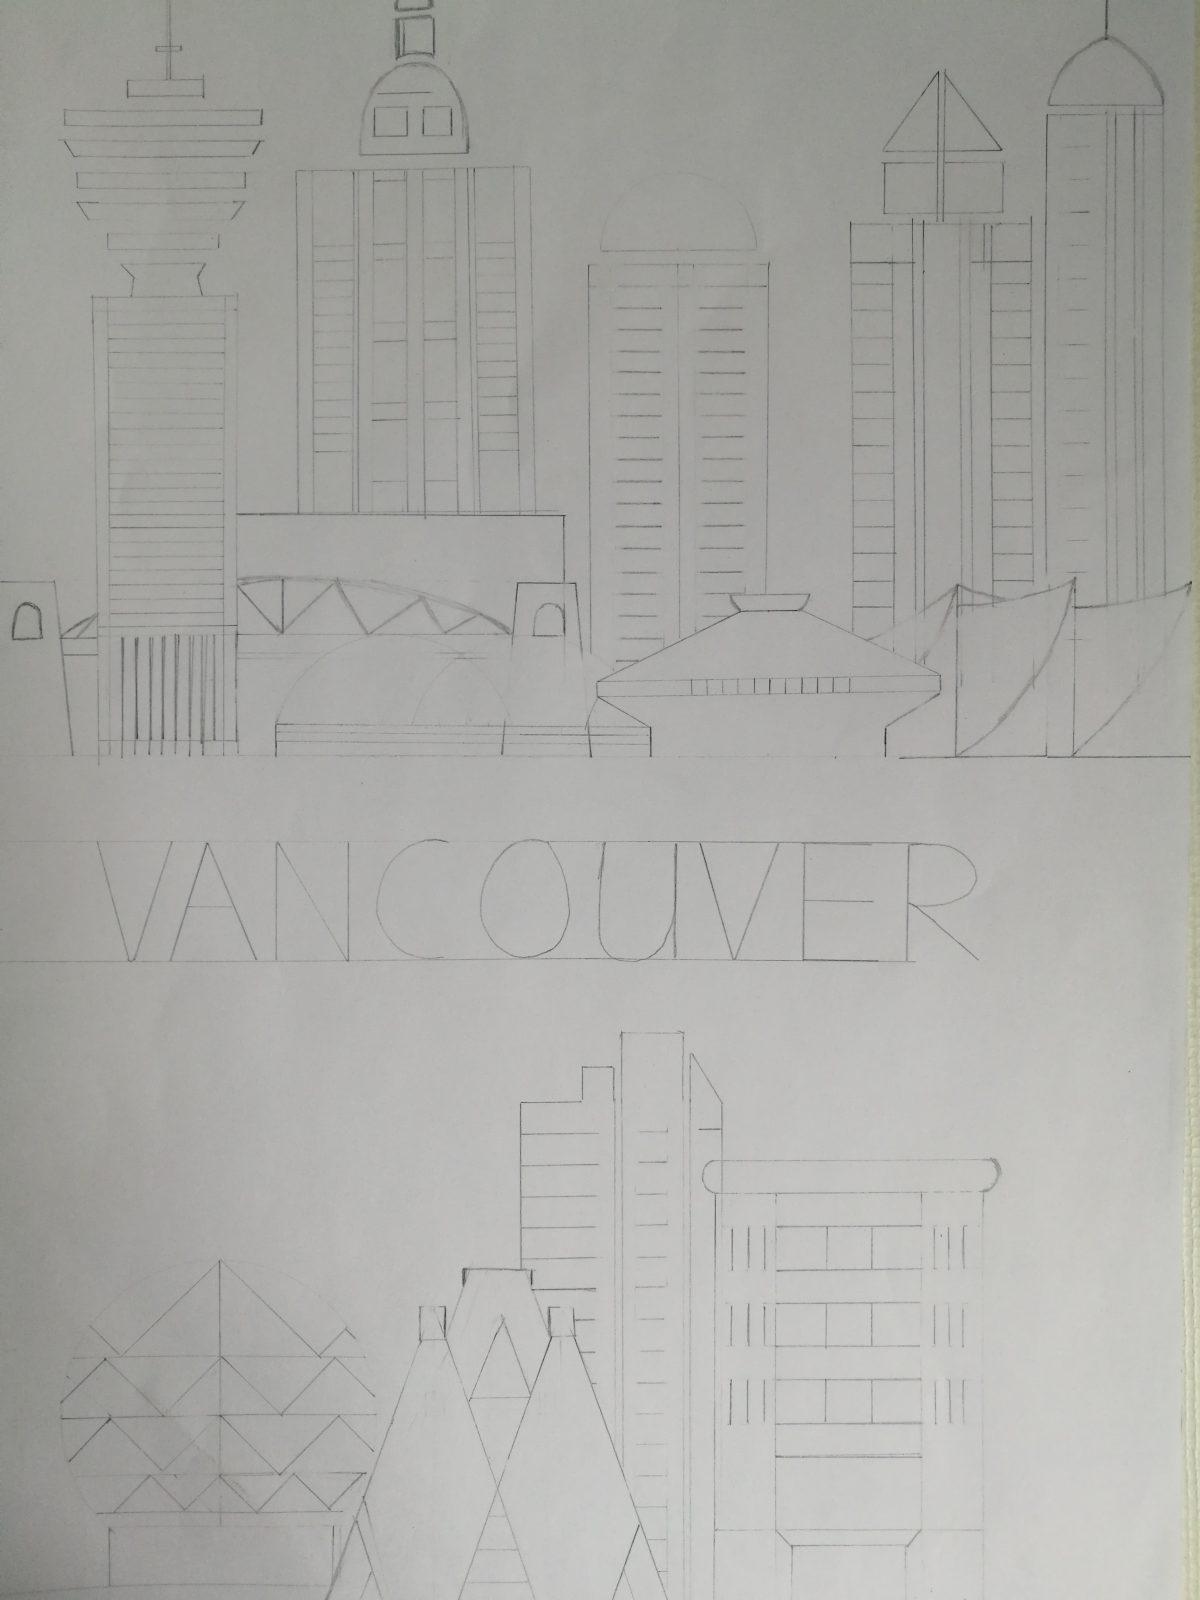 Uhr: Vancouver